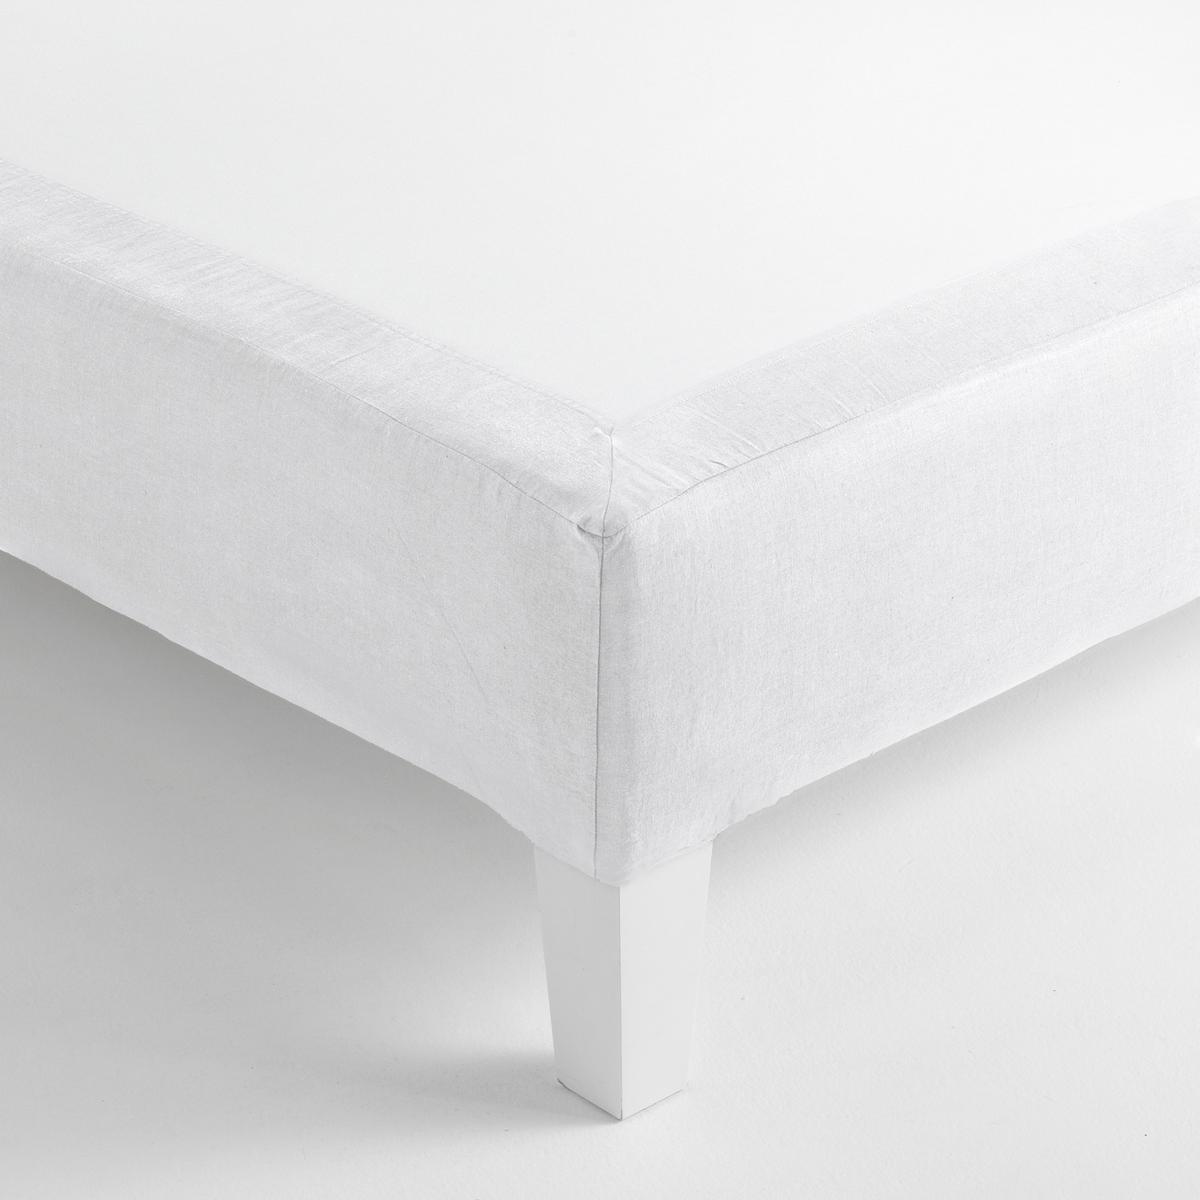 Чехол LaRedoute Для кровати из льнахлопка Gram 2 x 80 x 200 см белый чехол laredoute для кровати 100 льна 160 x 200 см белый